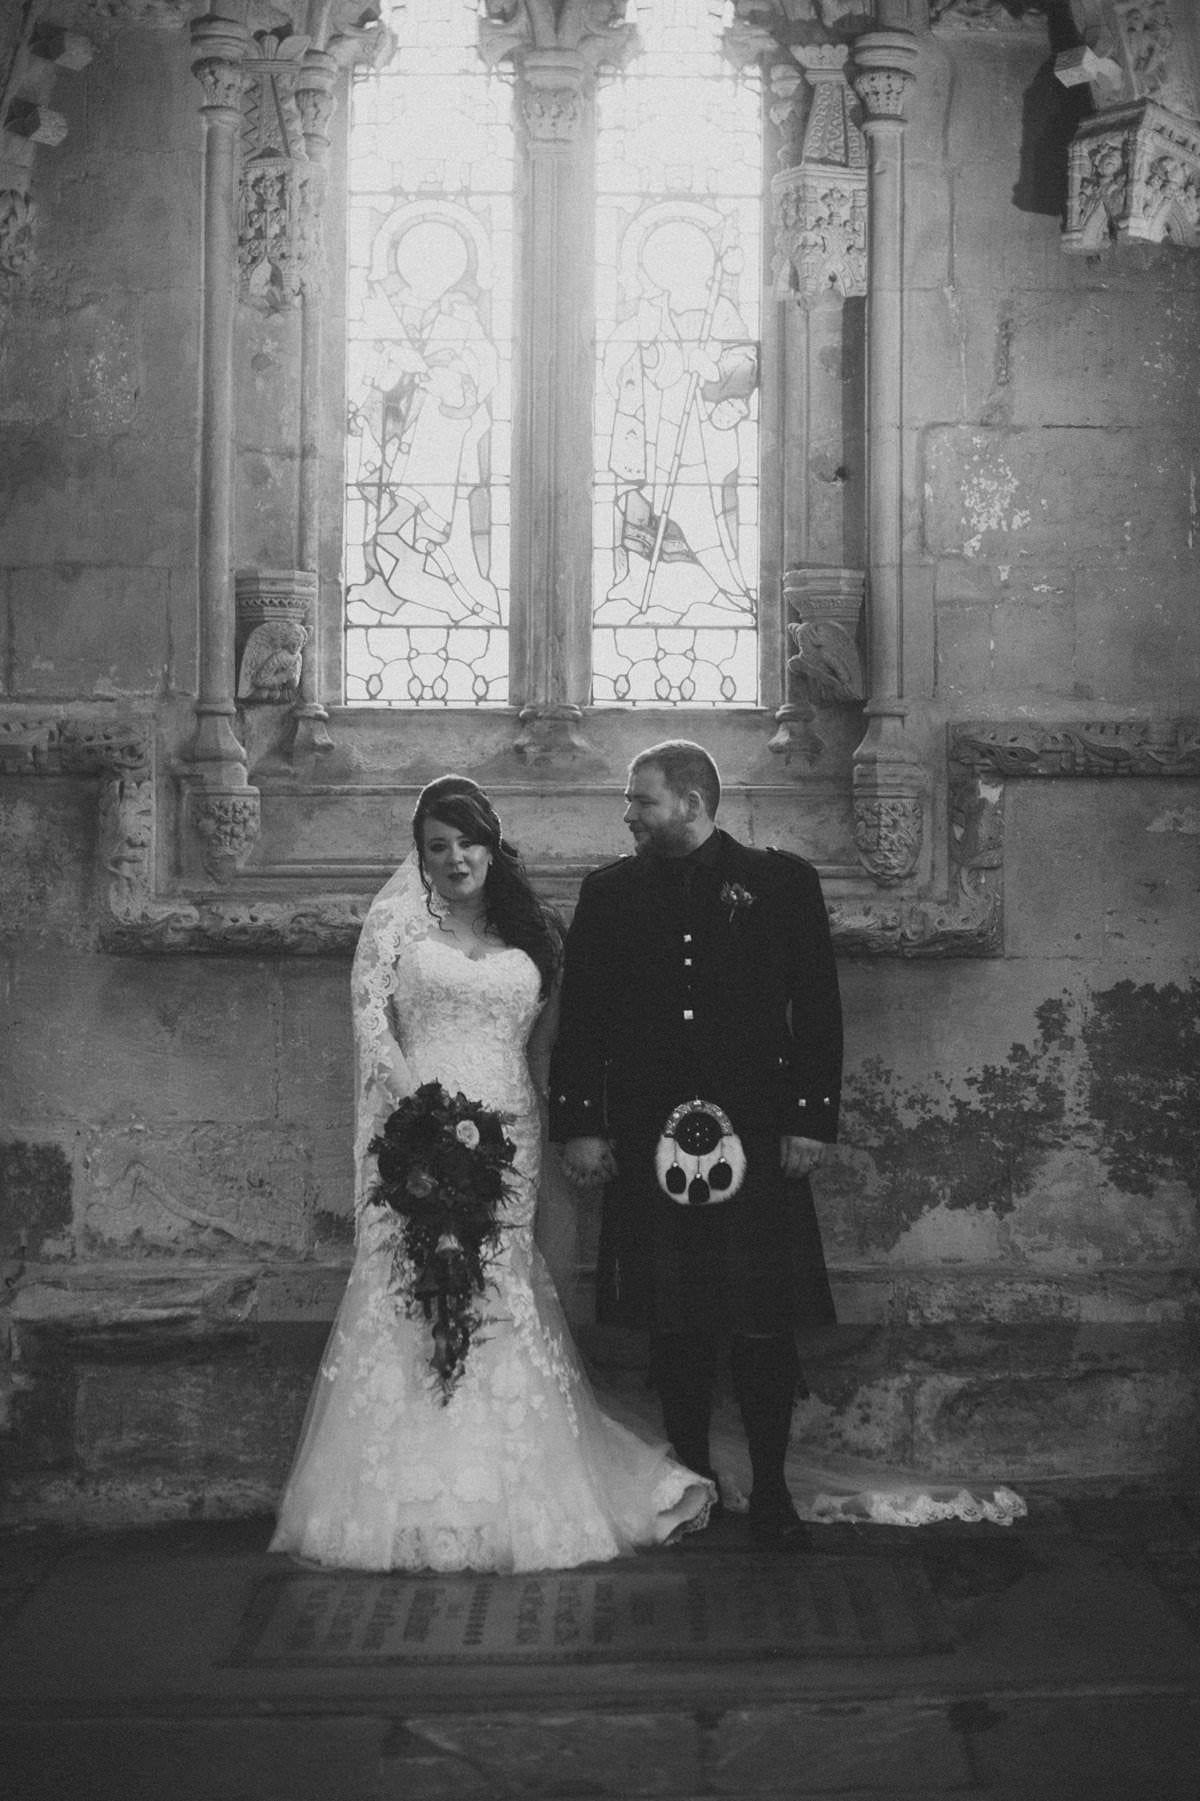 fine-art-wedding-photography-edinburgh-rosslyn-oxenfoord-castle-076